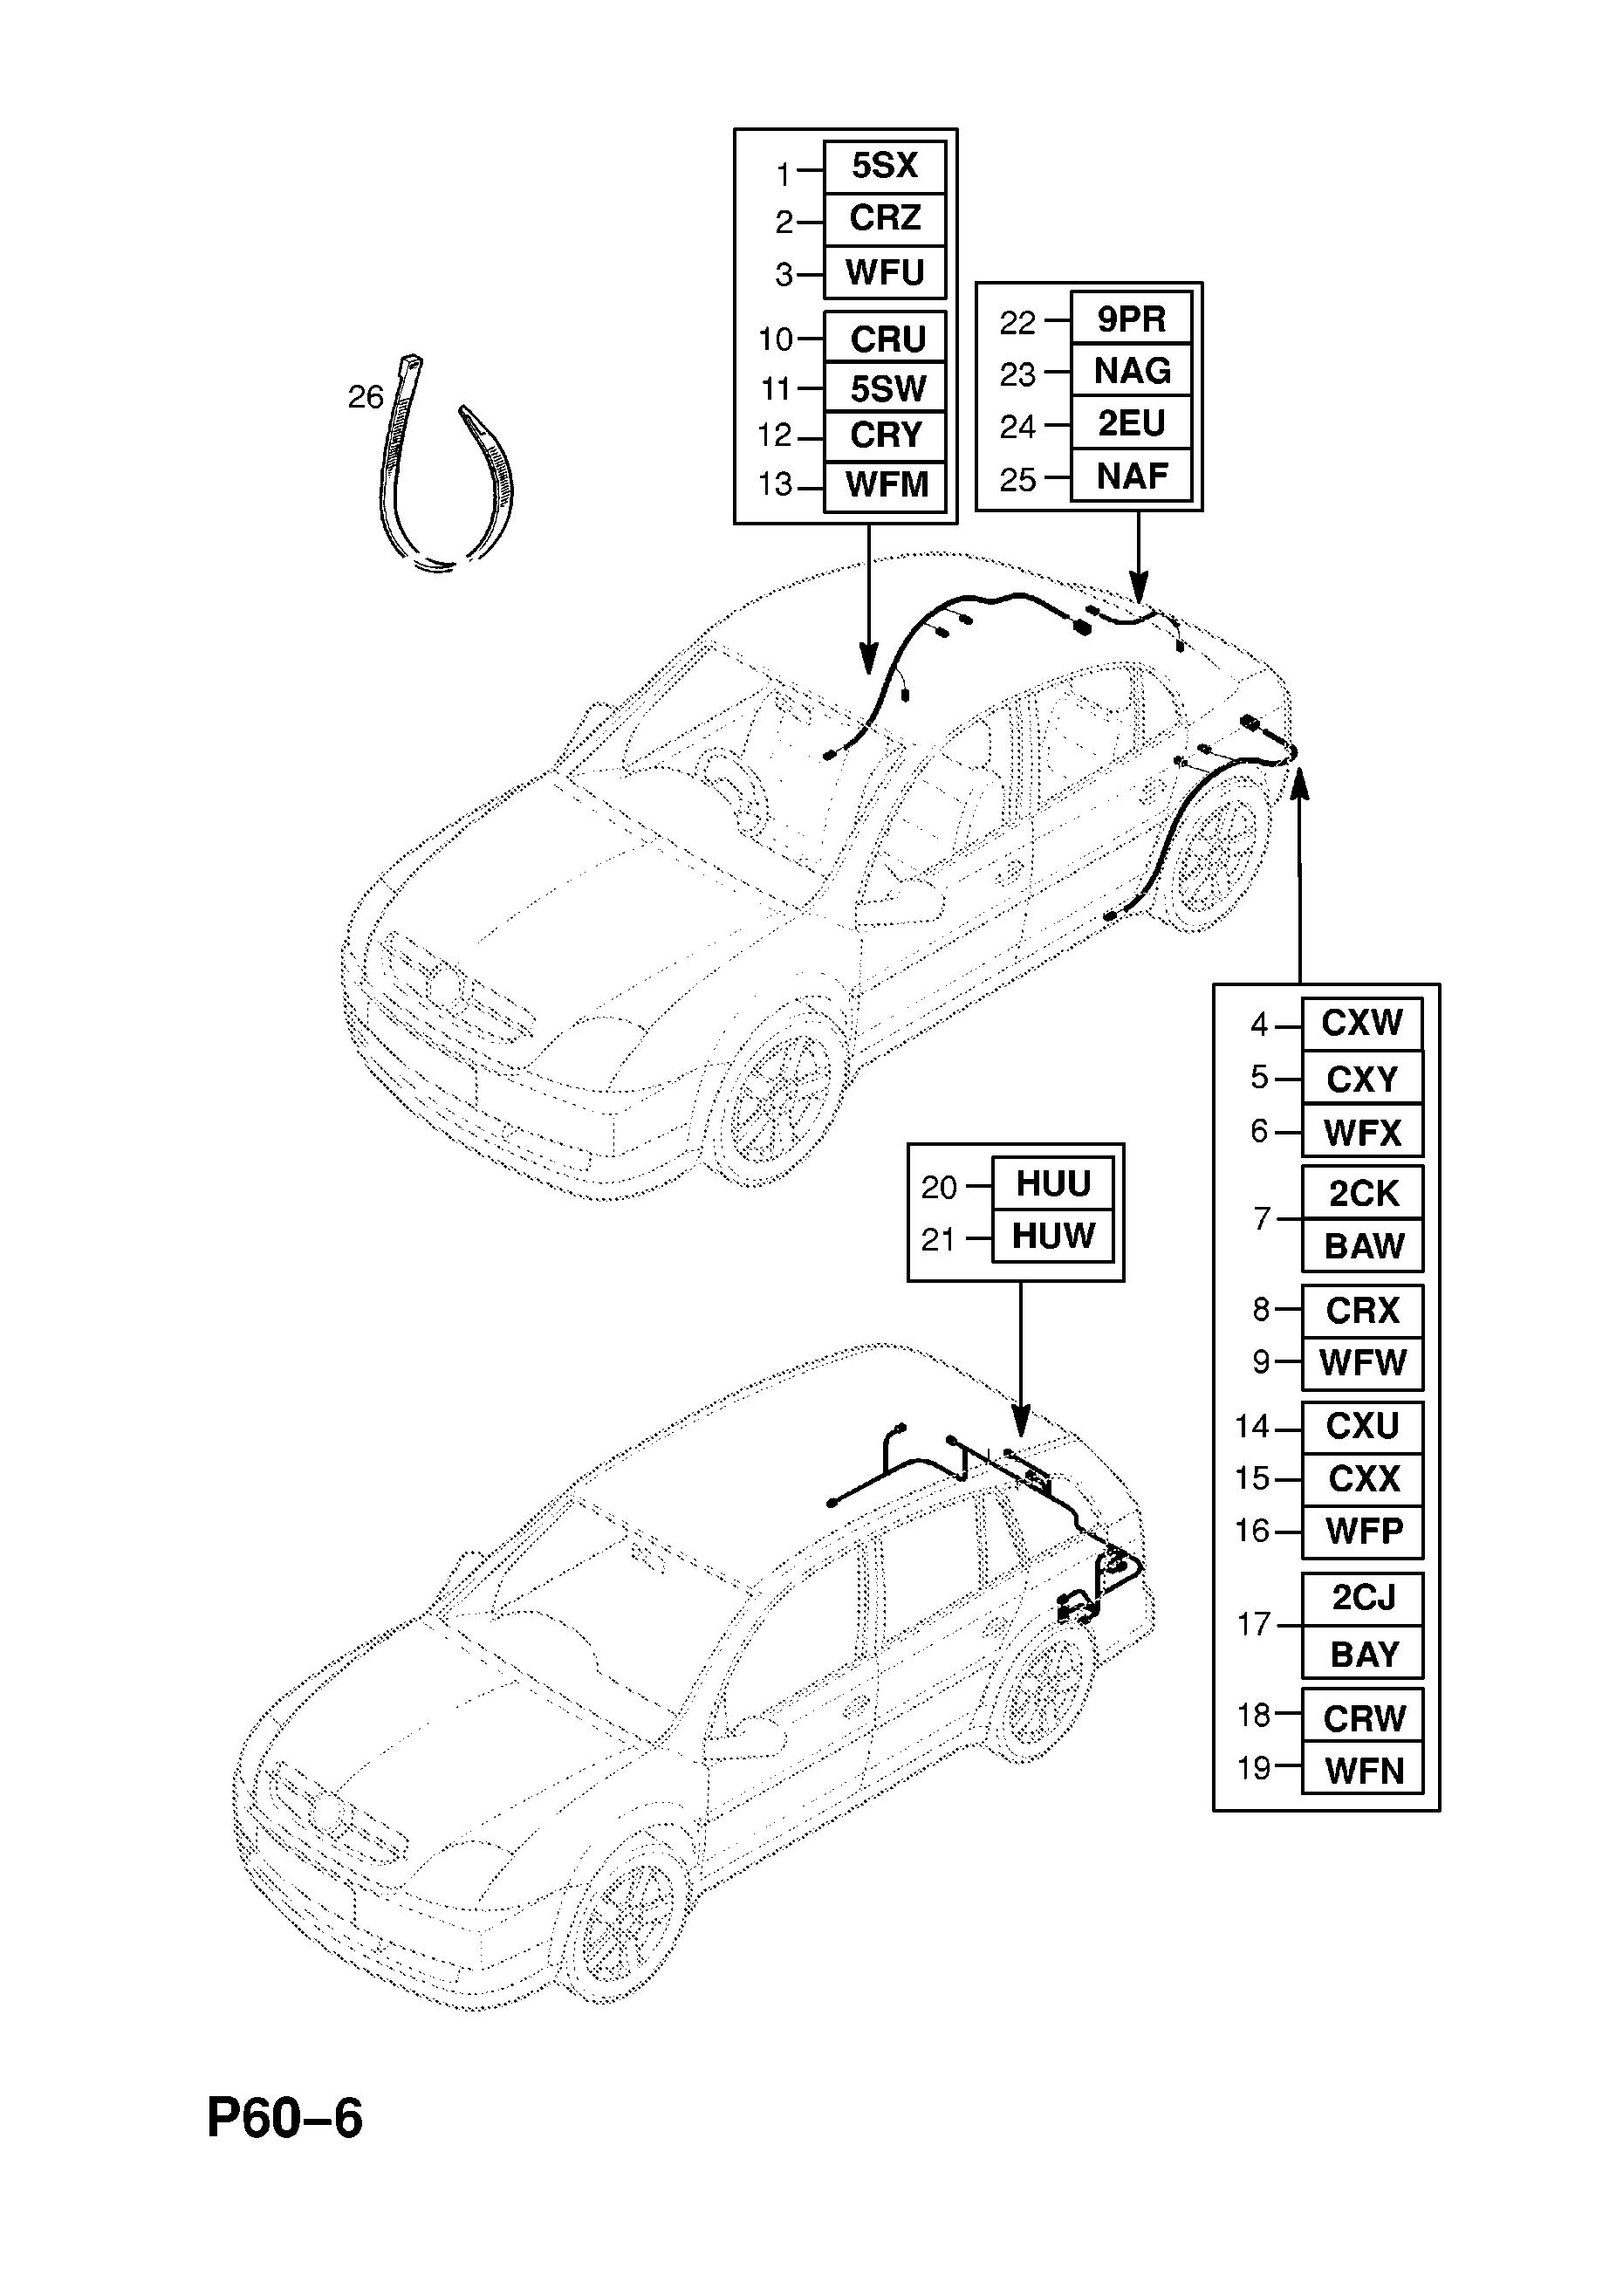 vectra c rear light wiring diagram